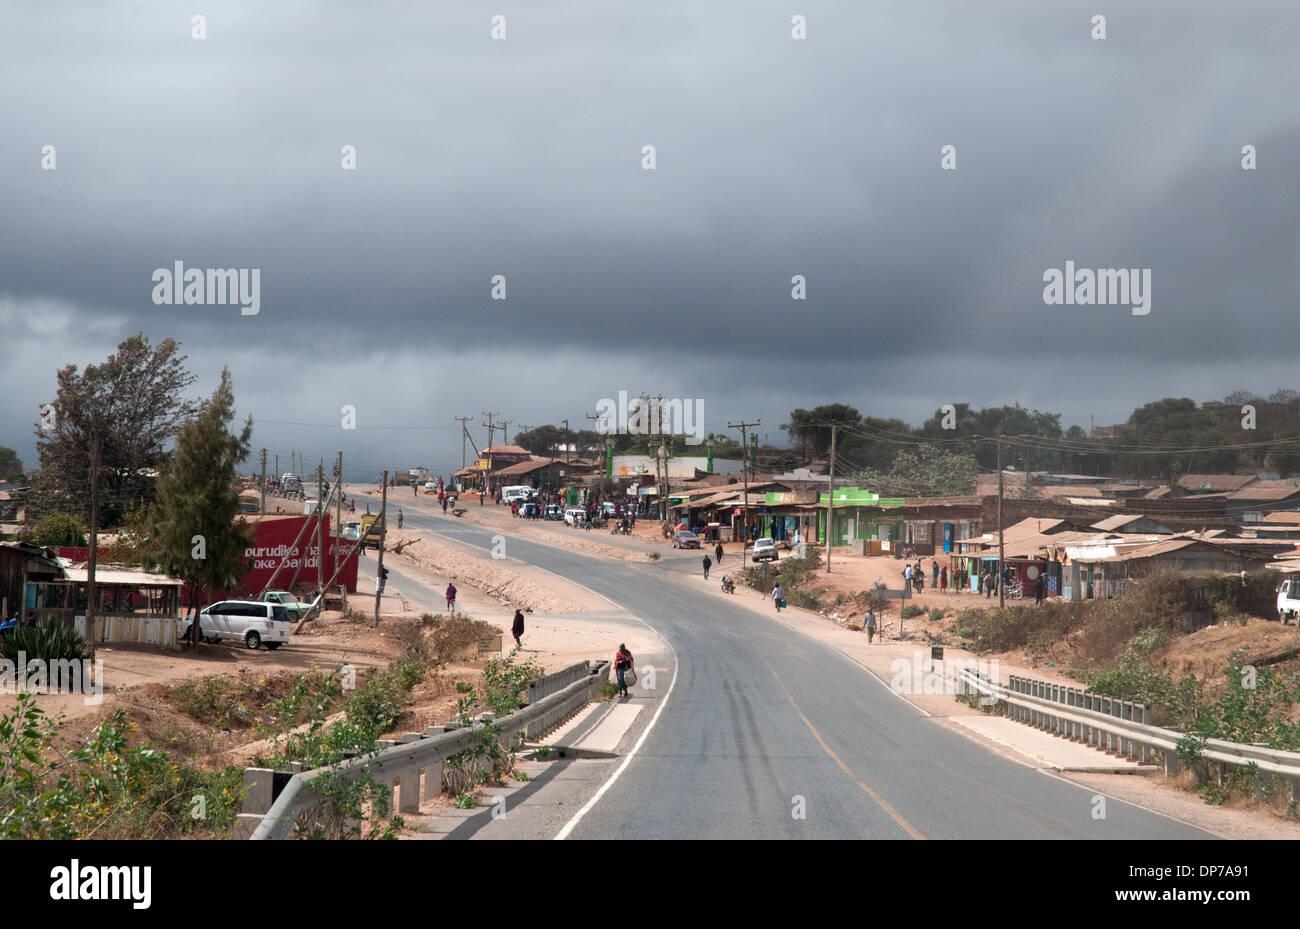 Village of Bissil or Bissel on Nairobi Namanga tarmac paved road Kenya Africa showing shops dukas people bridge and power lines - Stock Image